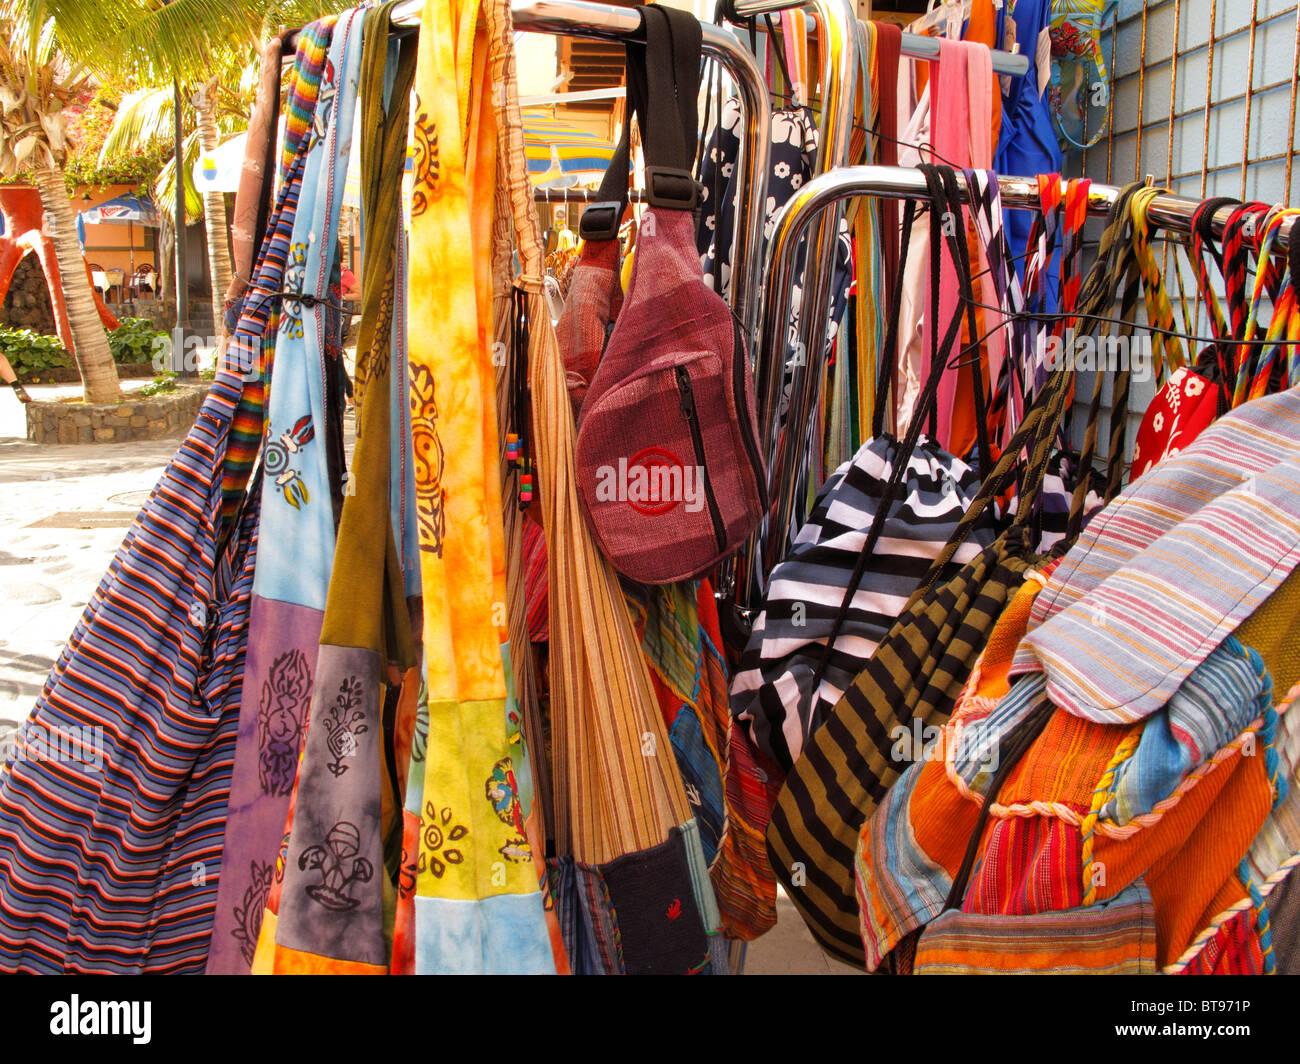 Des sacs en tissu coloré, Puerto de Tazacorte, La Palma, Canary Islands, Spain, Europe Photo Stock